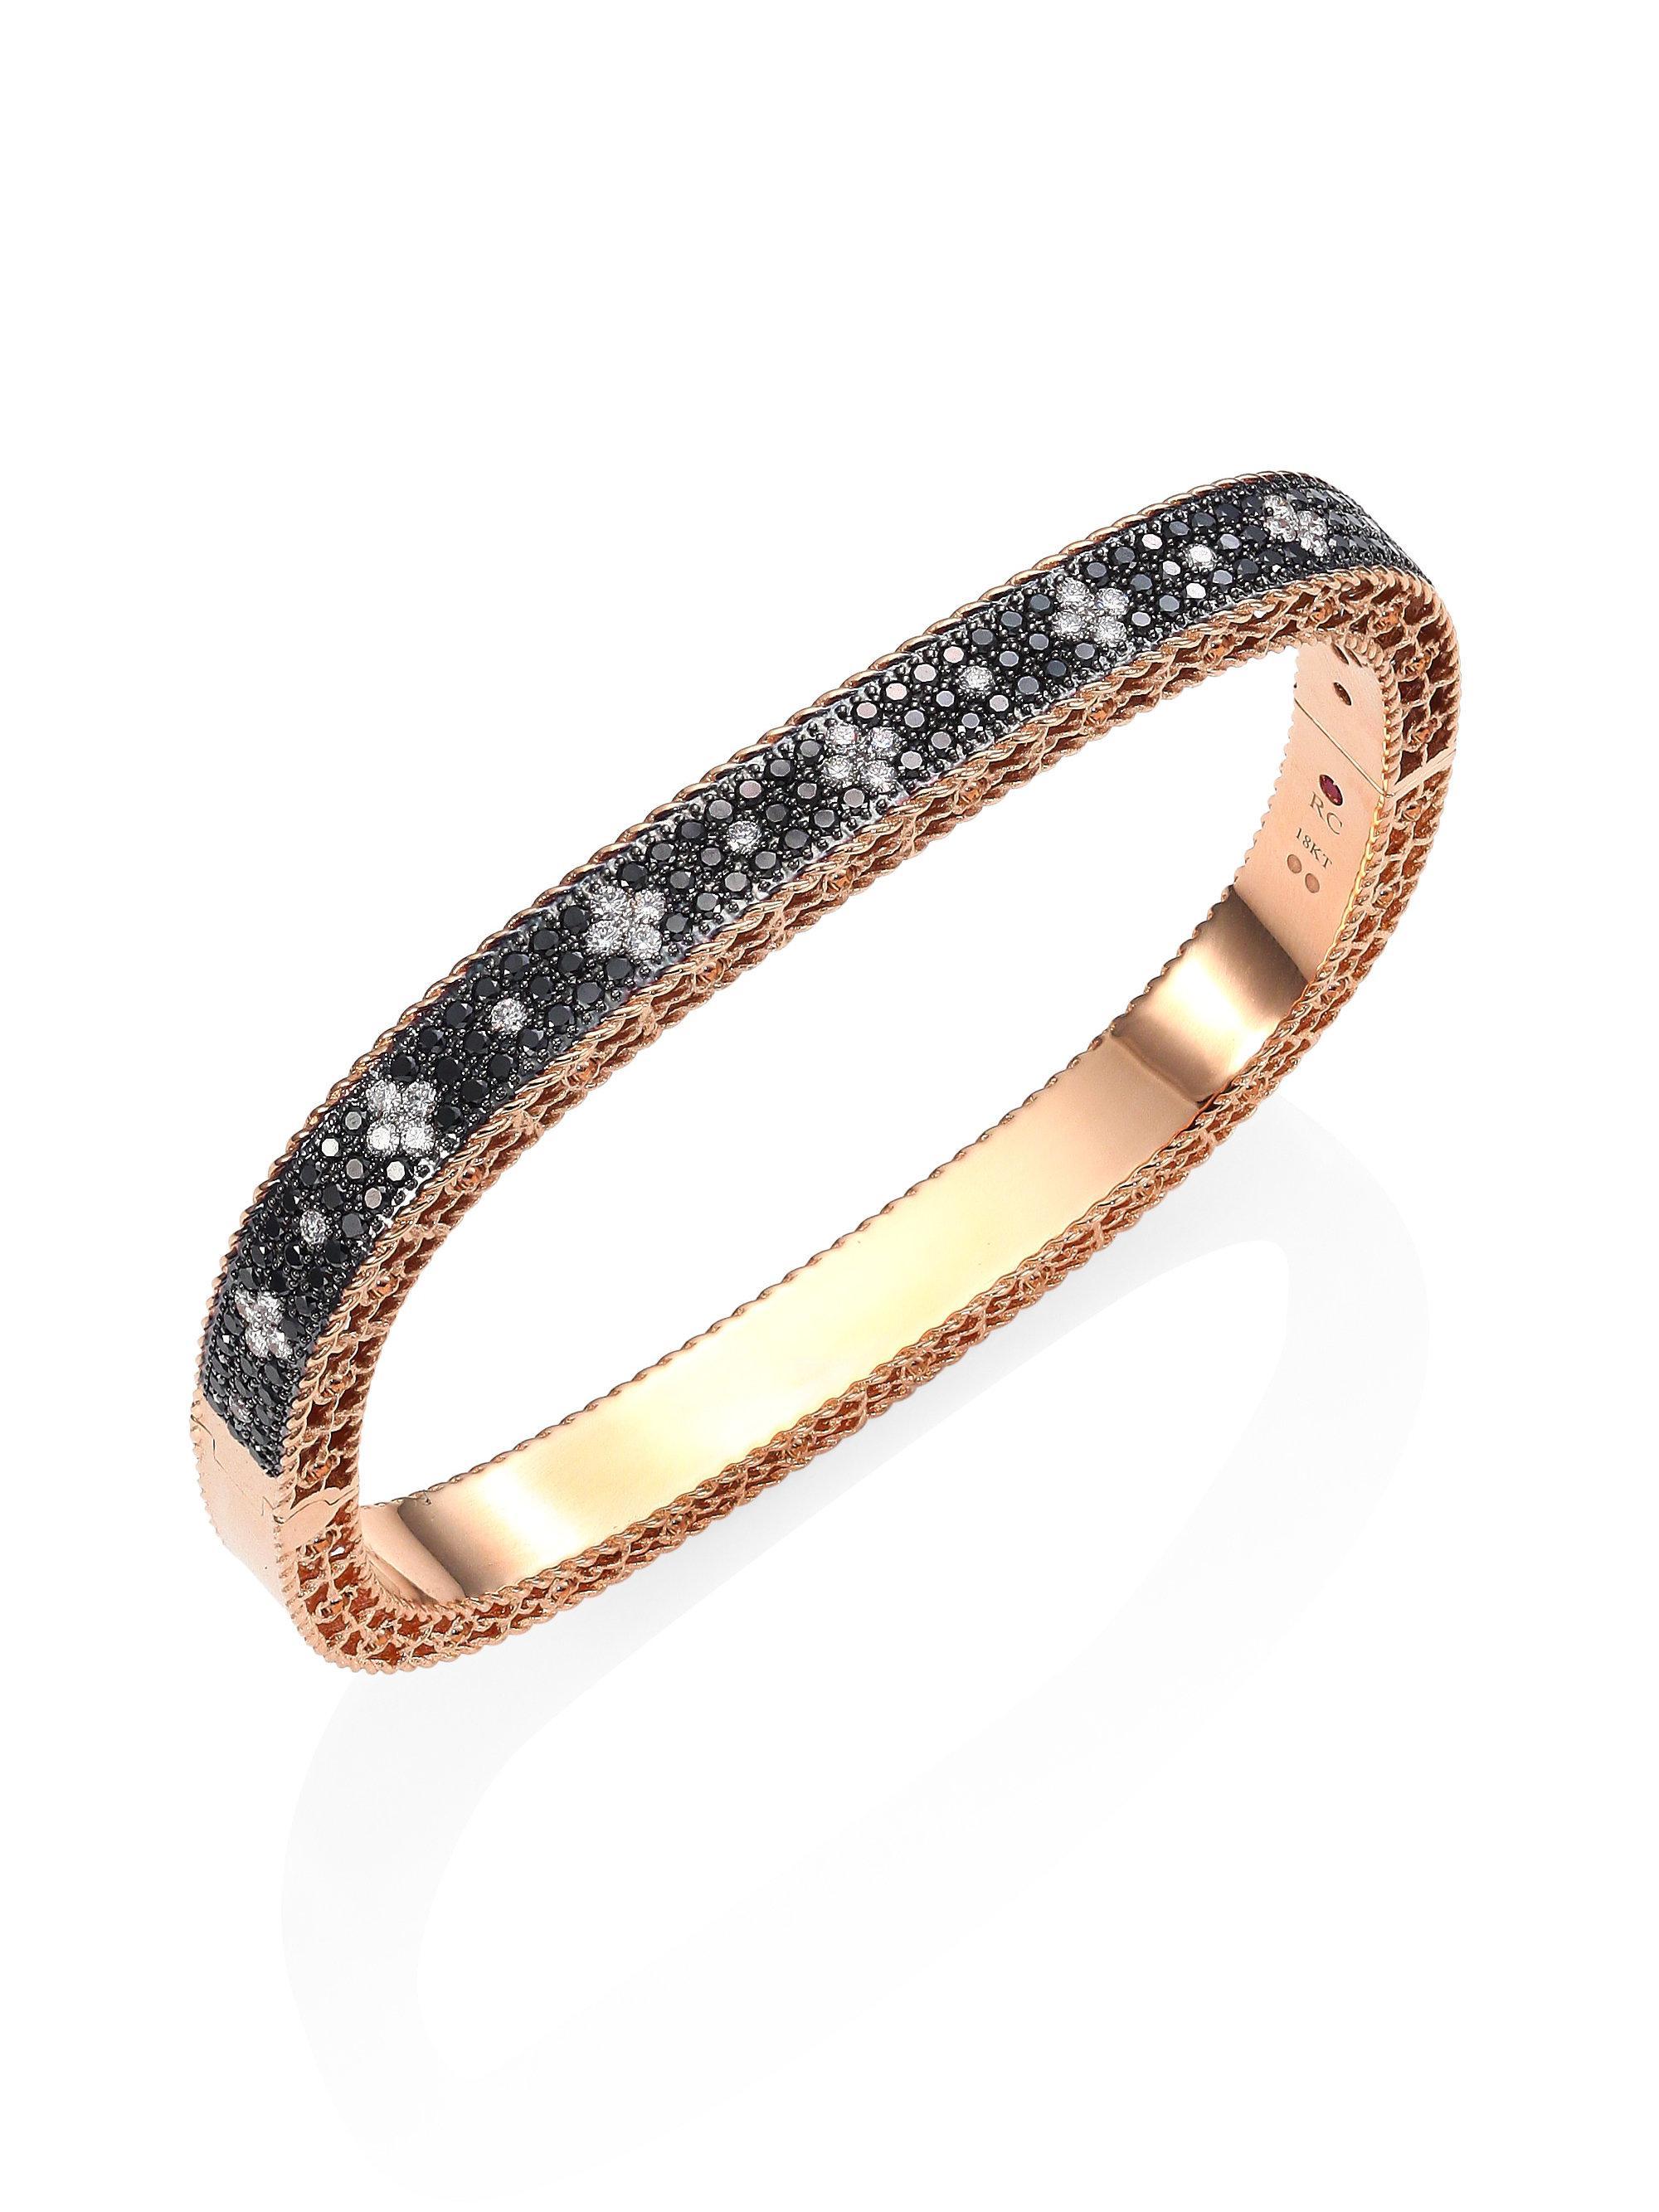 Roberto Coin 18k Venetian Princess Diamond Bracelet pFg62Jn